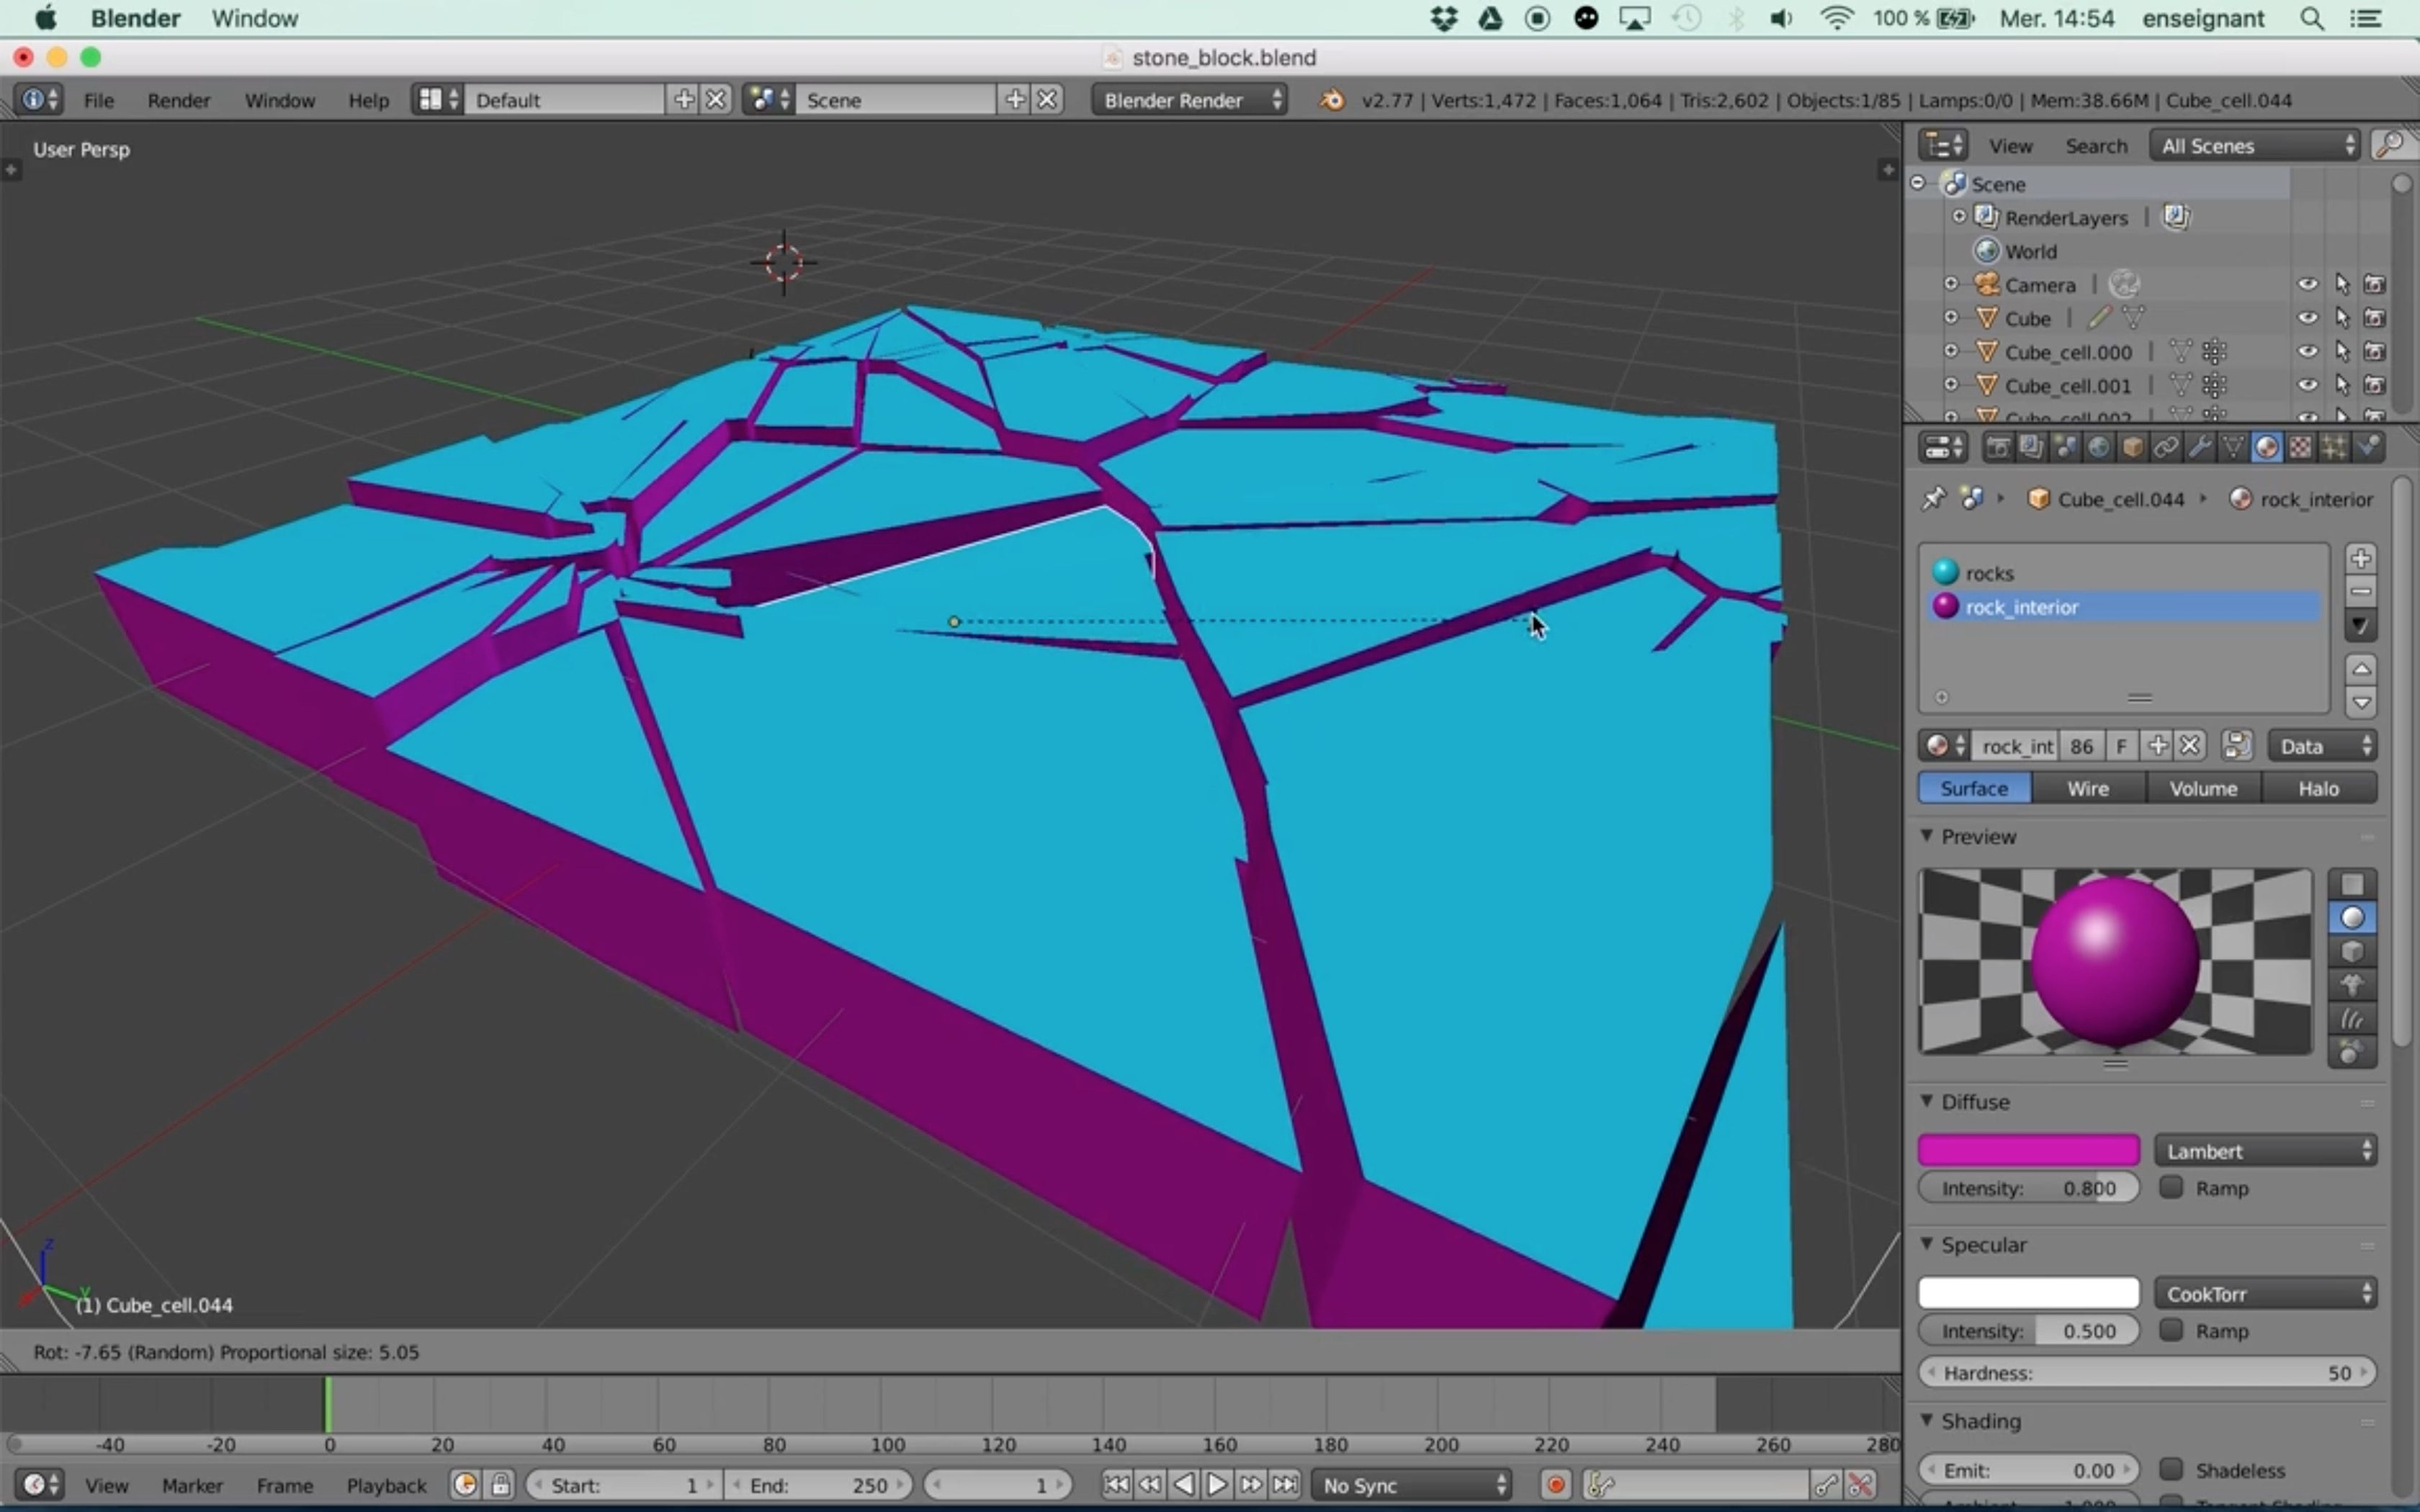 Modeling Broken Element Using Cell Fracture in Blender